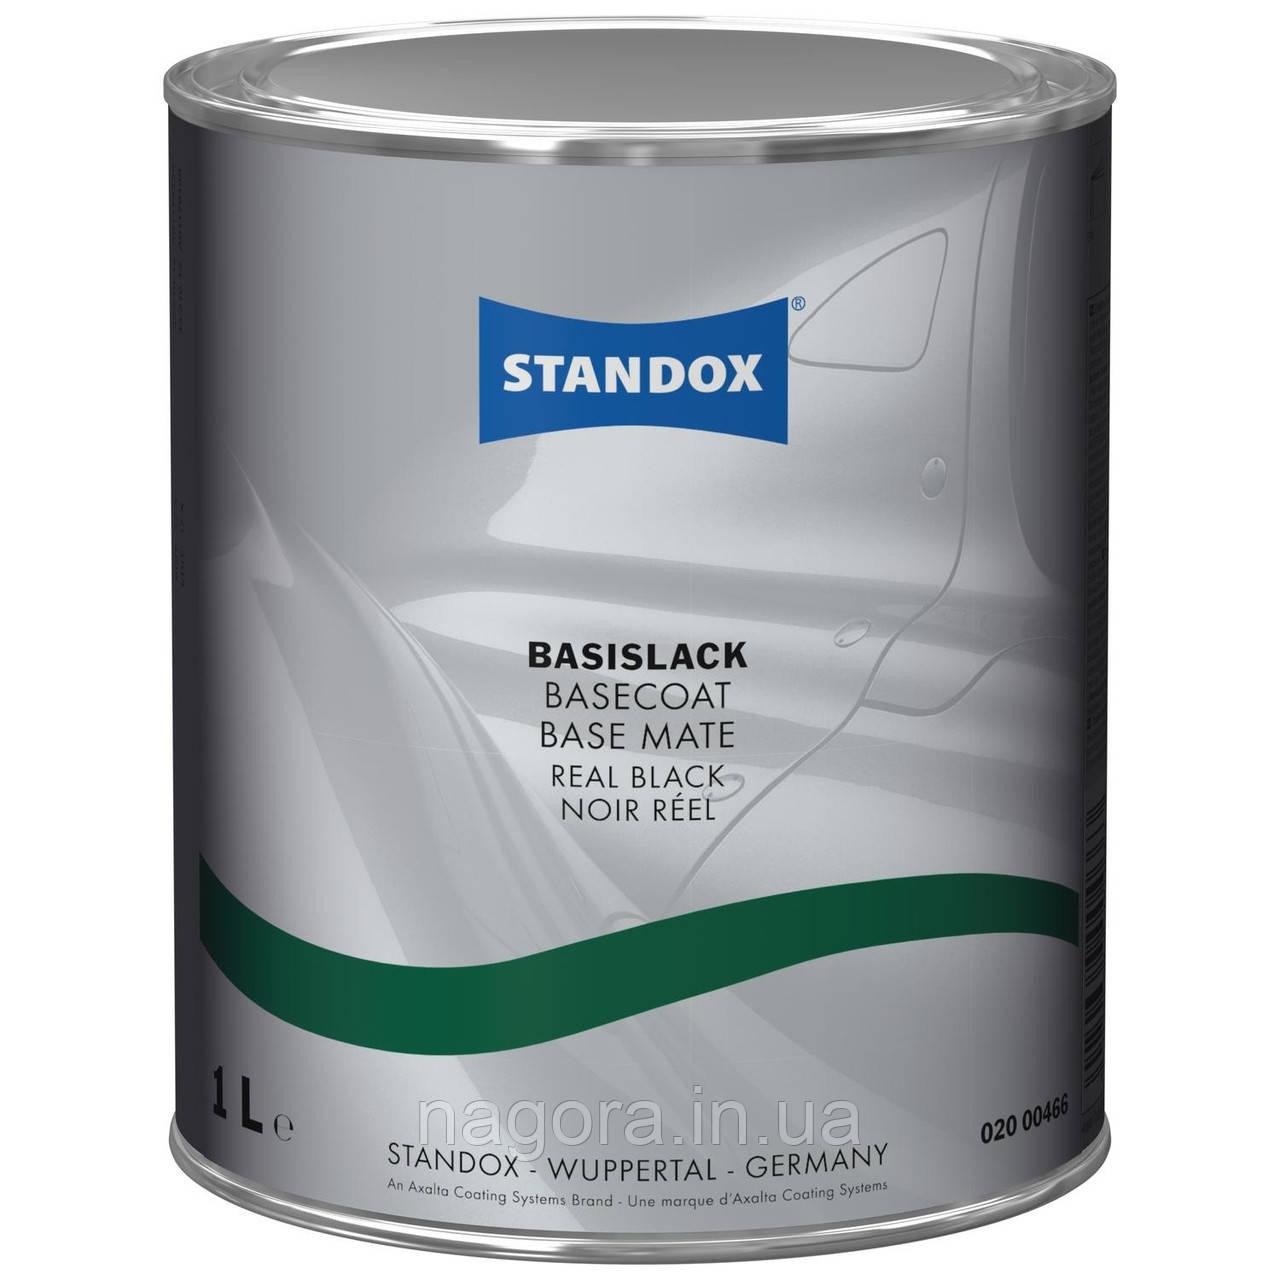 Готовое покрытие Standox Basecoat Real Black (1л)